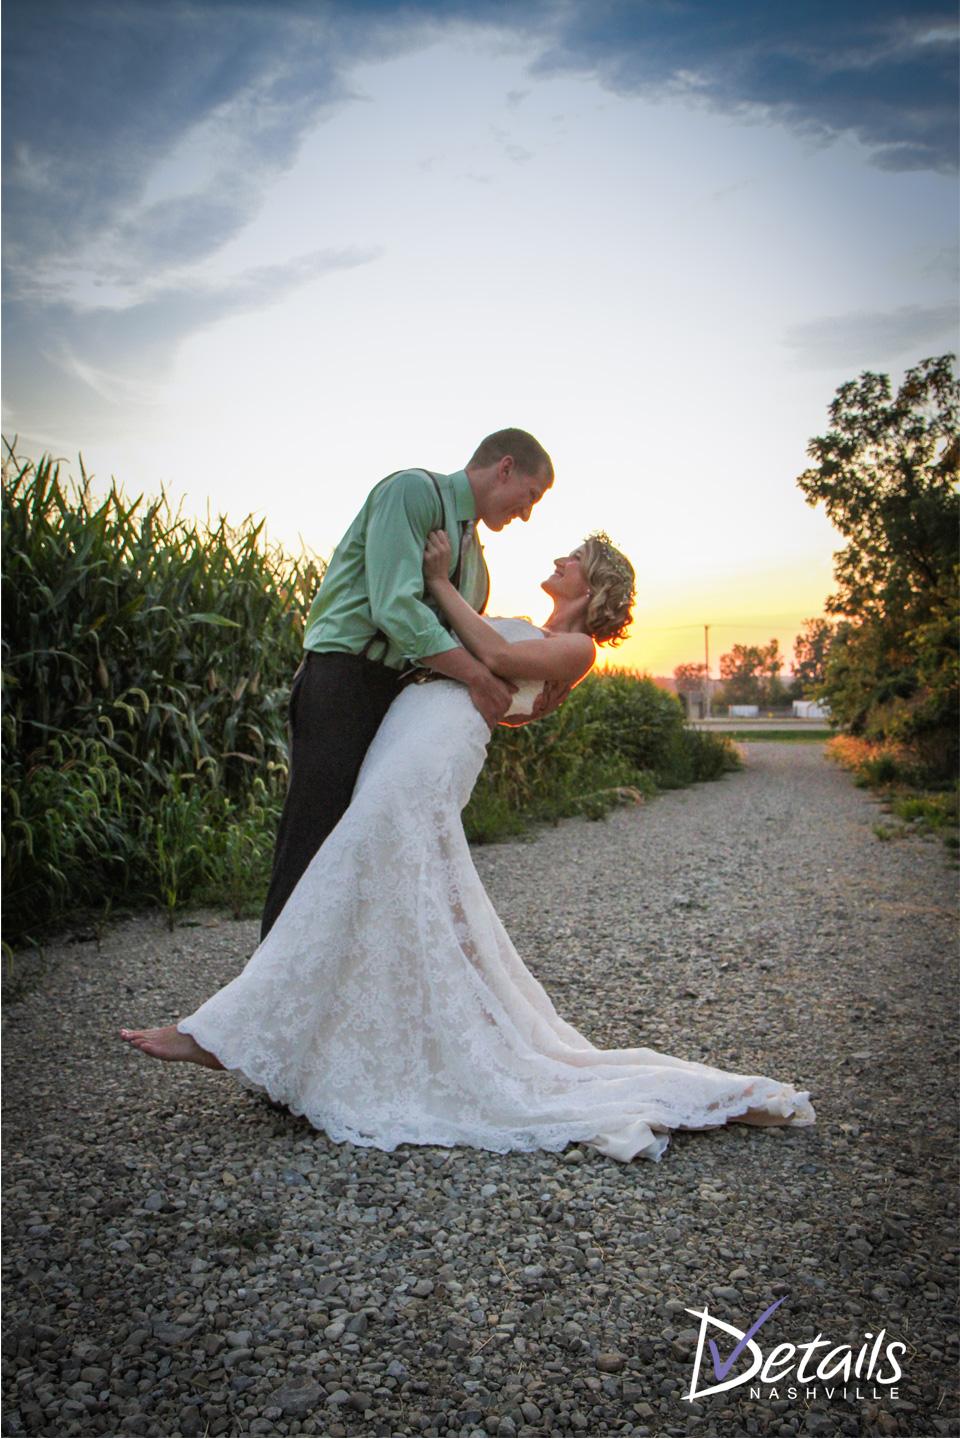 Widman Wedding - Details Nashville